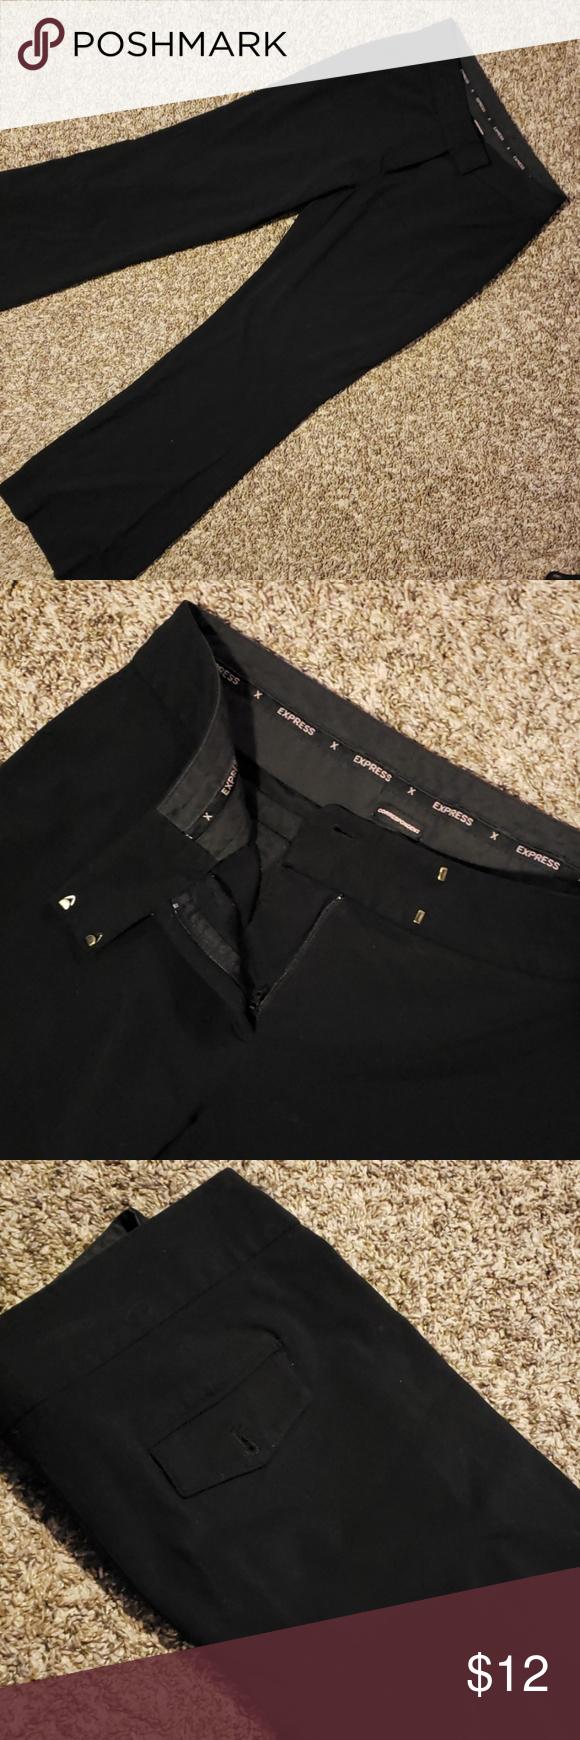 3 12 Express Correspondent Dress Slacks Dress Slacks Clothes Design Black Dress Pants [ 1740 x 580 Pixel ]